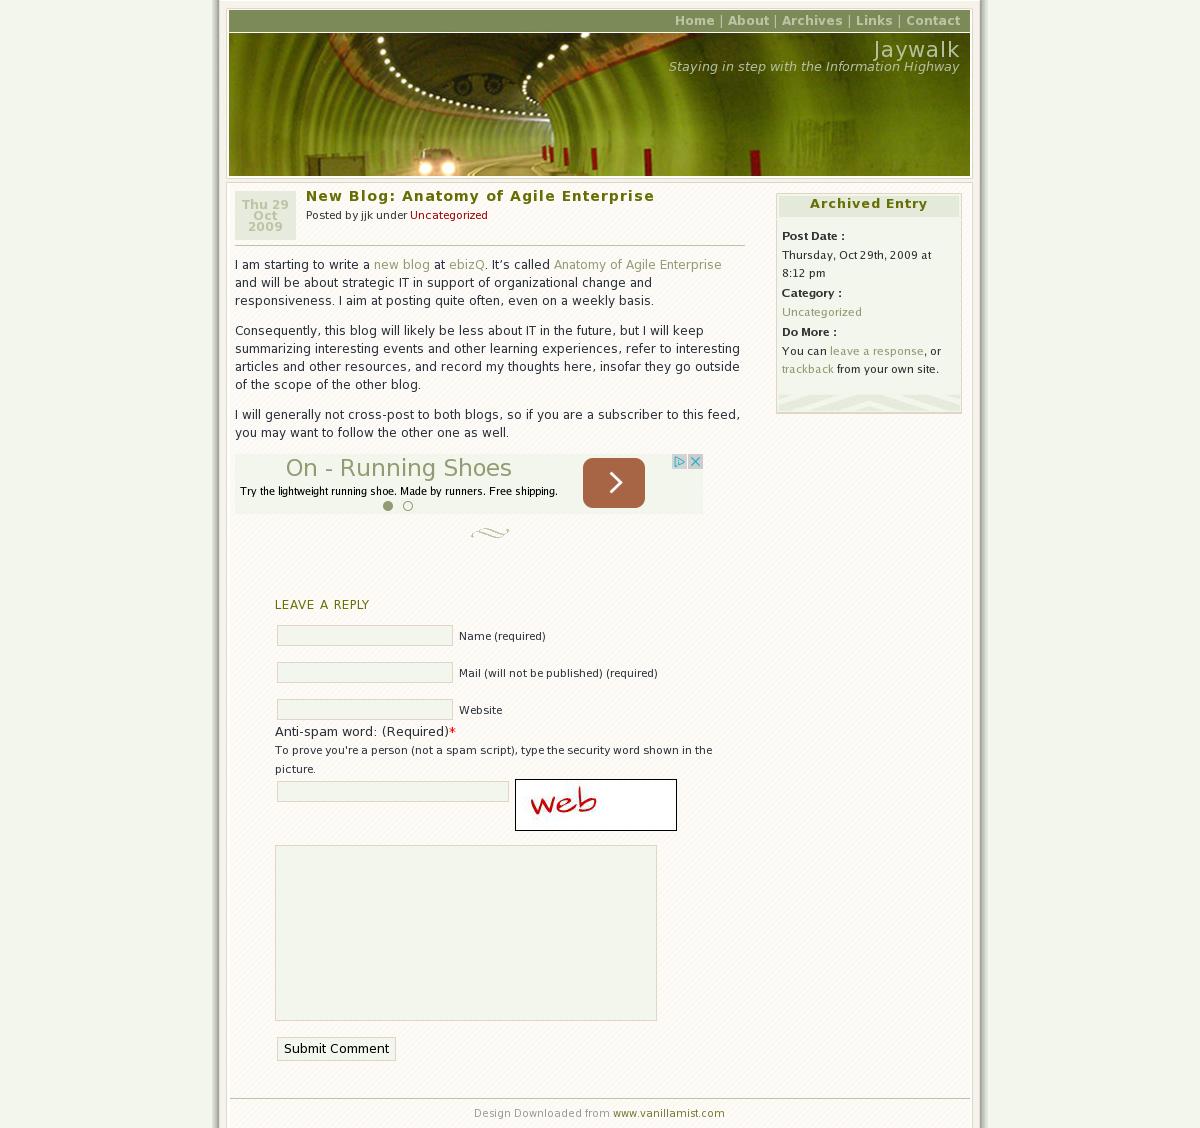 New Blog: Anatomy of Agile Enterprise - BPI - The destination for ...